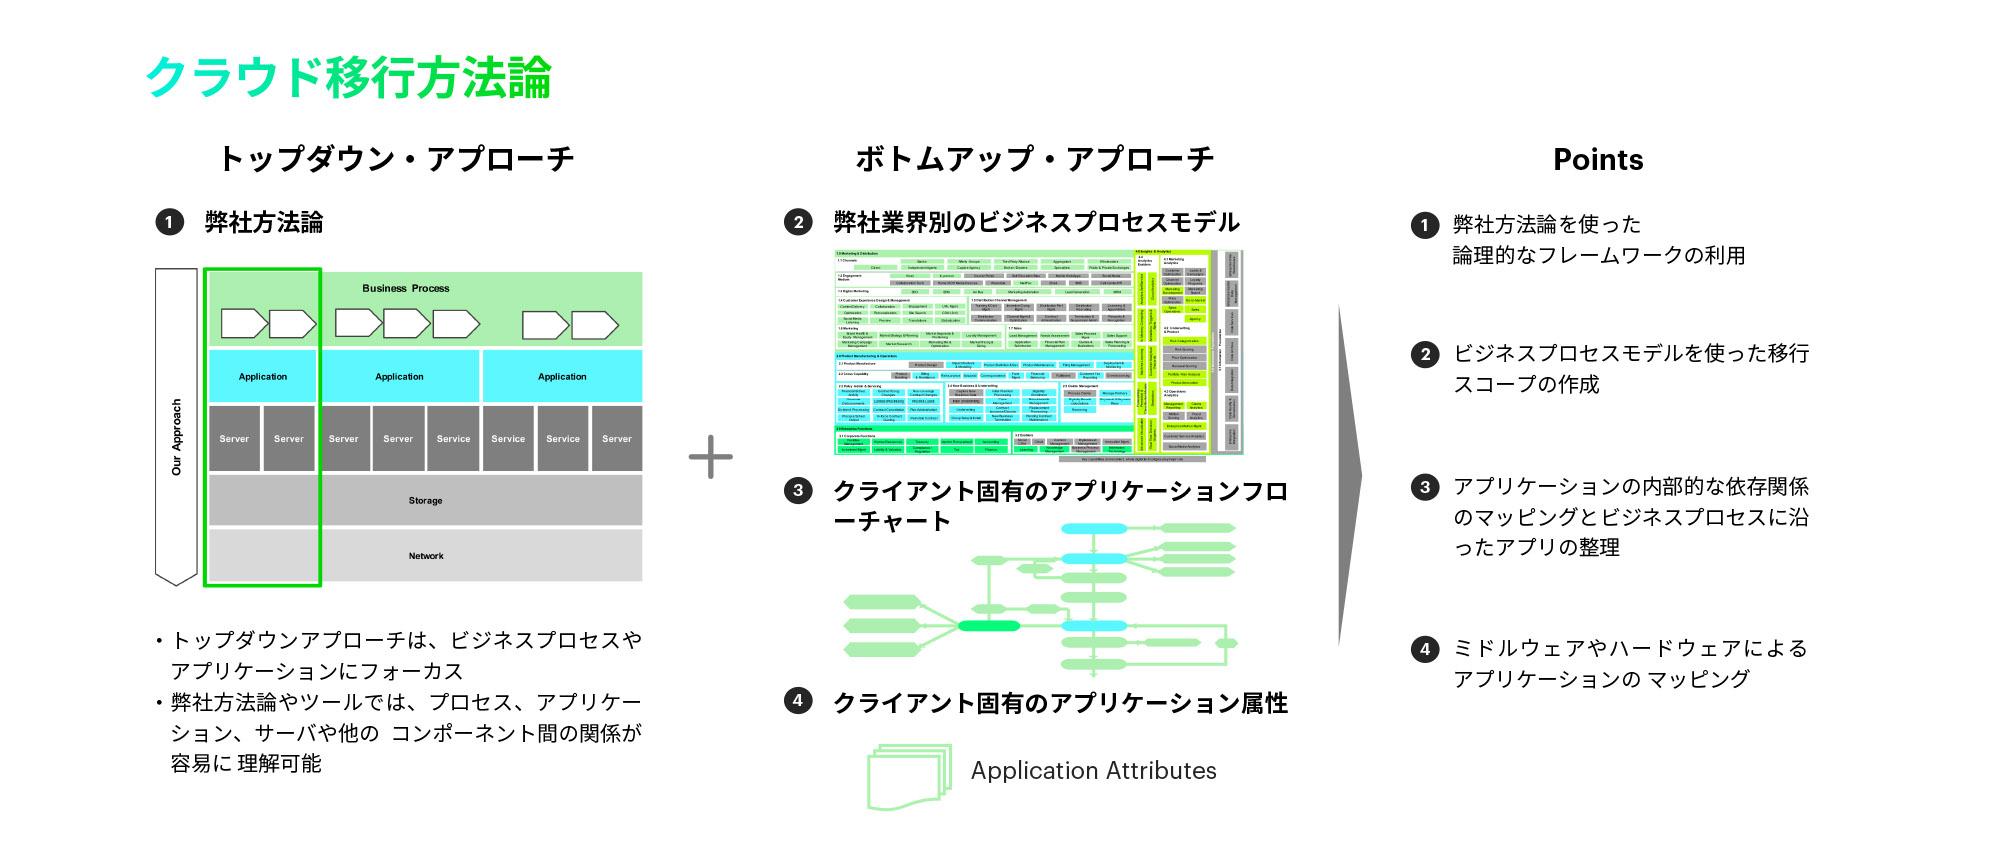 https://www.accenture.com/t00010101T000000Z__w__/jp-ja/_acnmedia/Accenture/Conversion-Assets/DotCom/Images/Local/ja-jp/5/Accenture-17-010764-Modernization-7Image10.jpgla=ja-JP